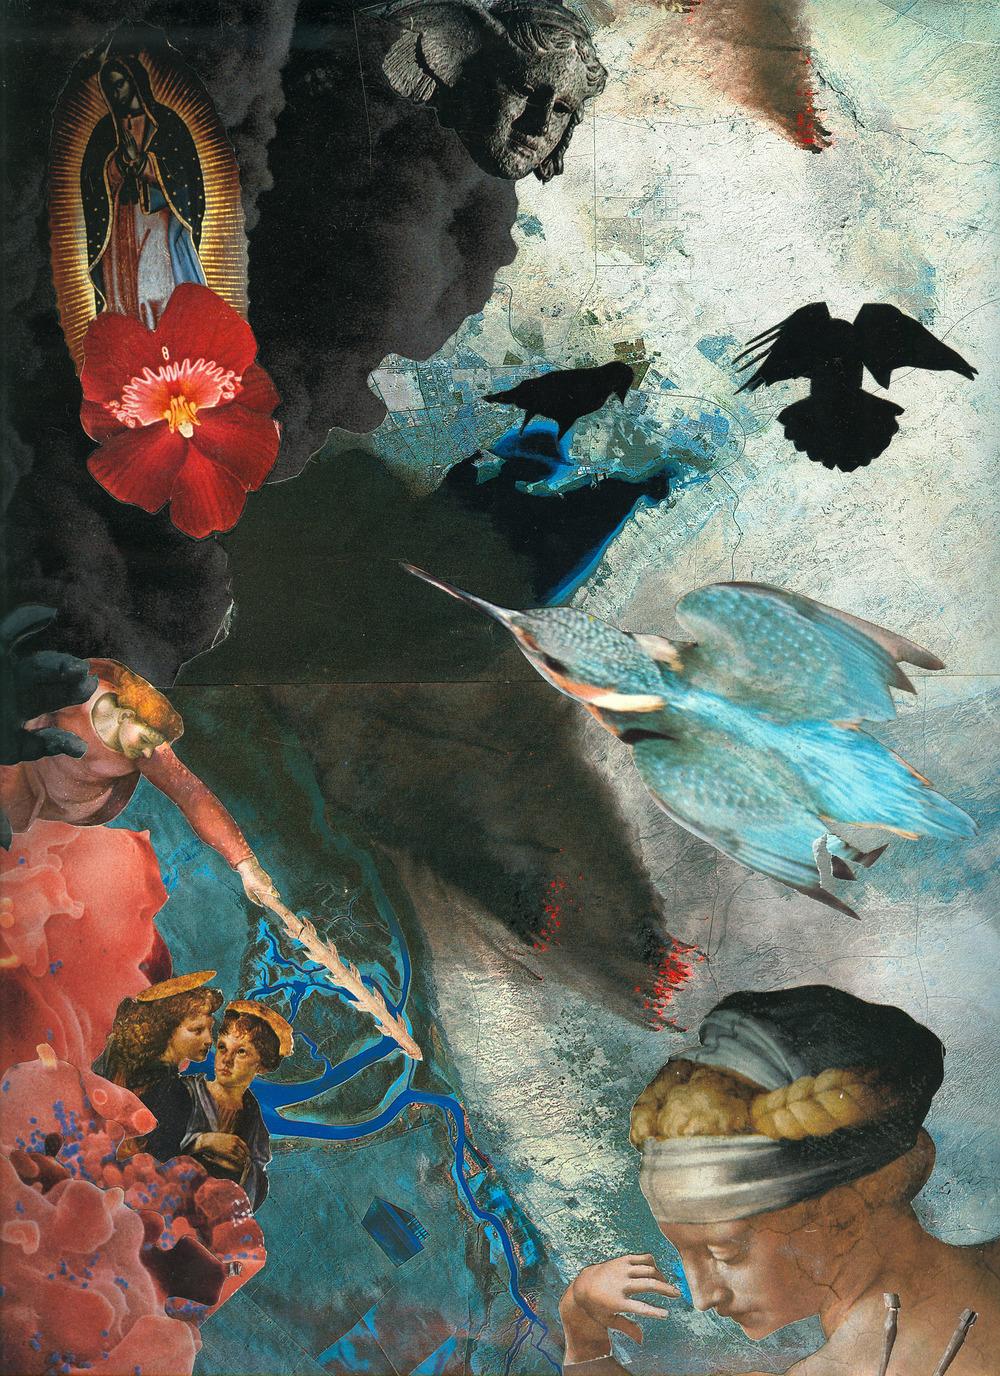 Agnieszka Sosnowska,Landing,Collage,1993